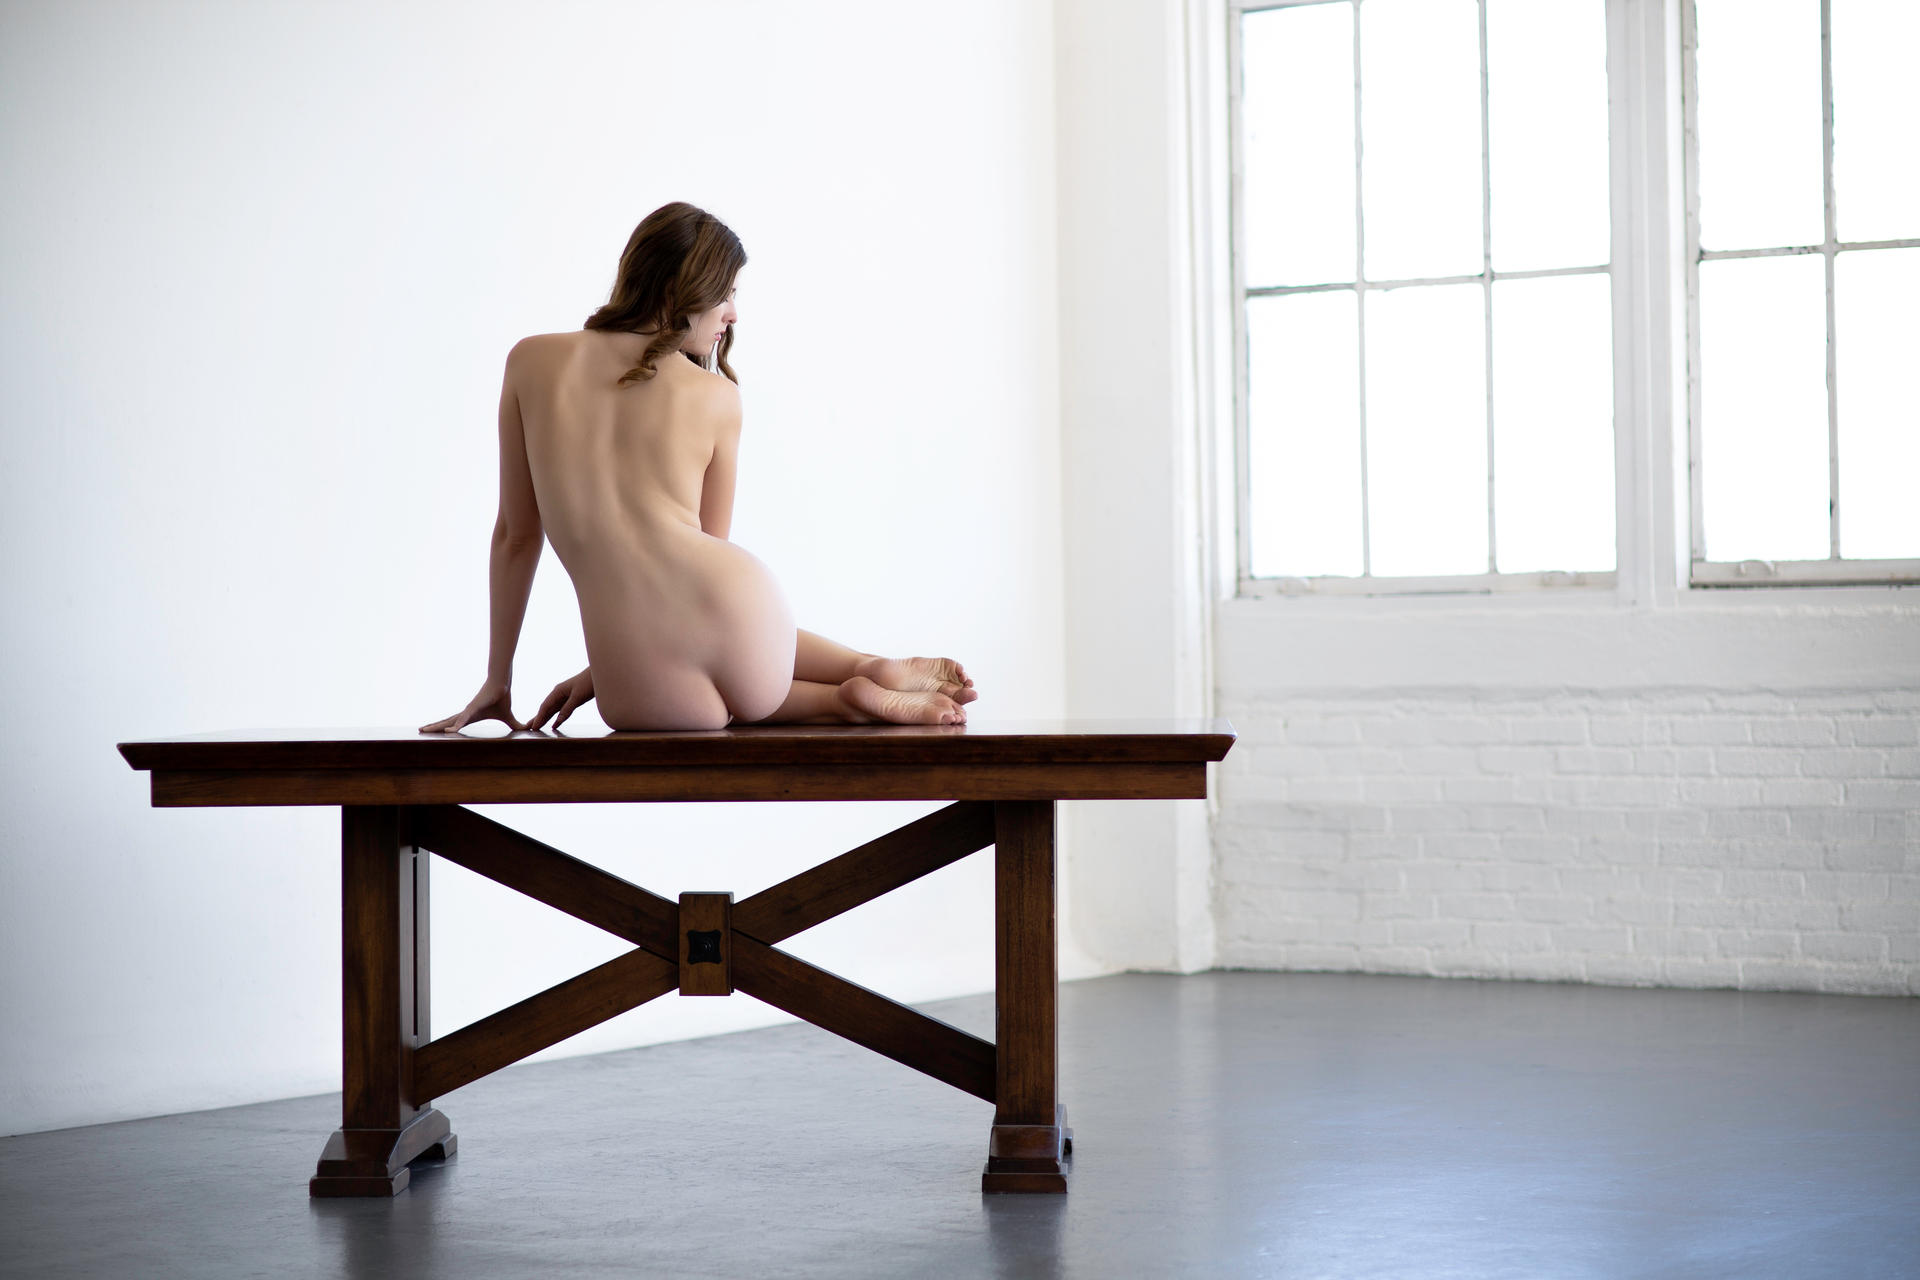 Allison Hayes Nude sienna hayes porn pic - eporner